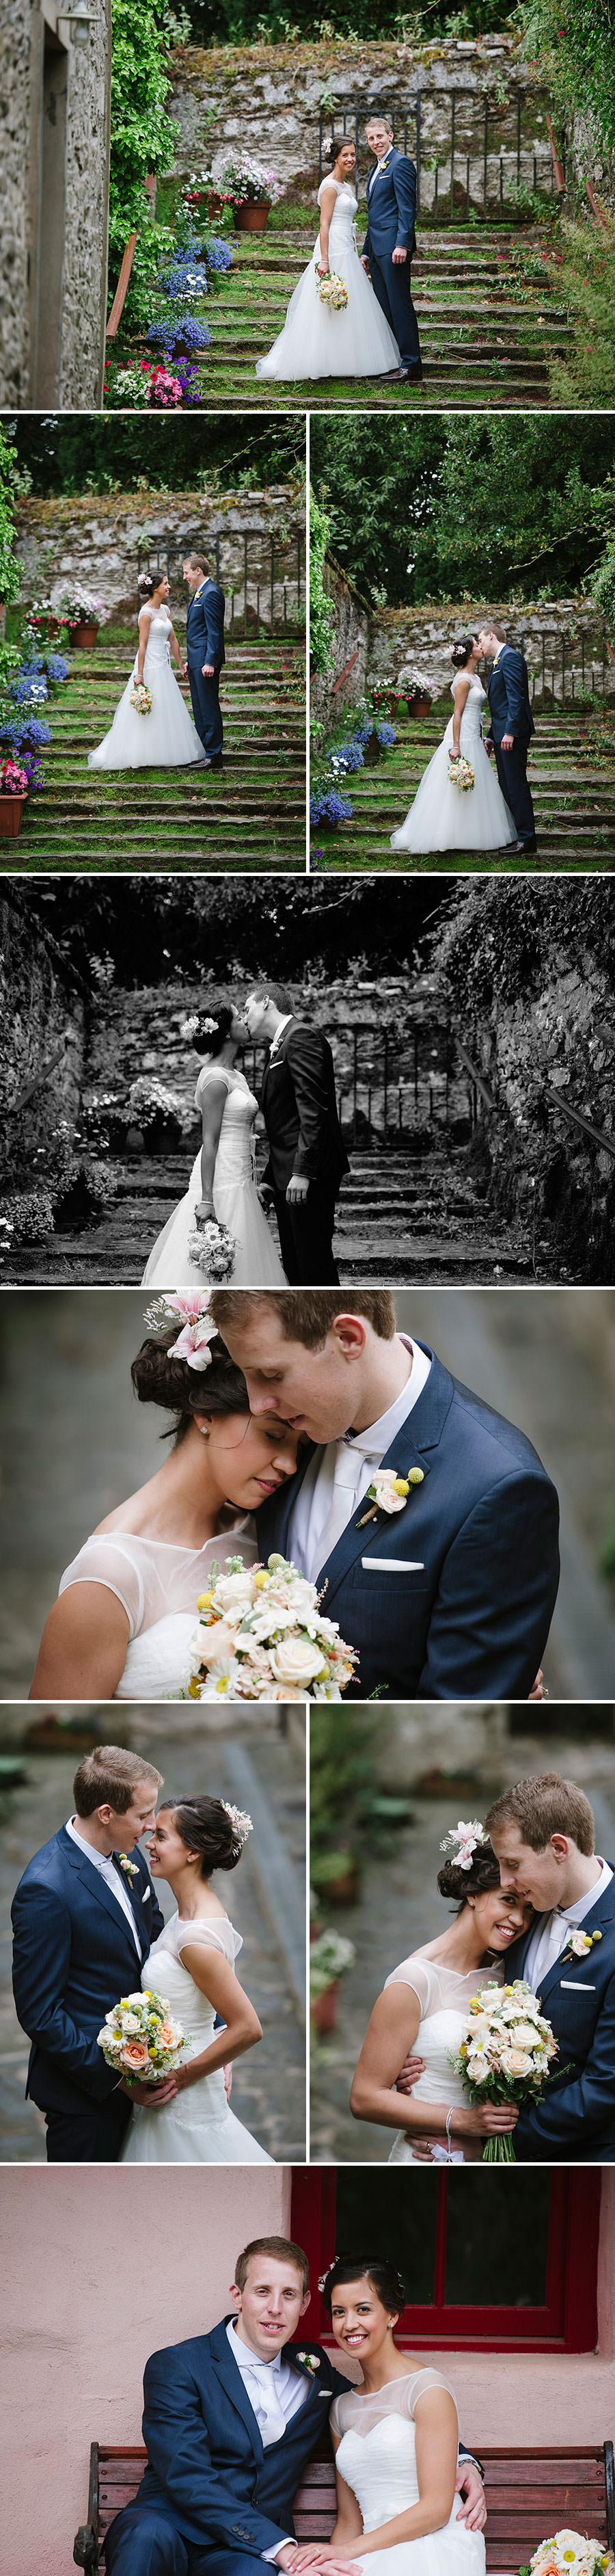 P + R | Barnabrow Country House Wedding | Irish - Australian Wedding | Cork Wedding Photography 13